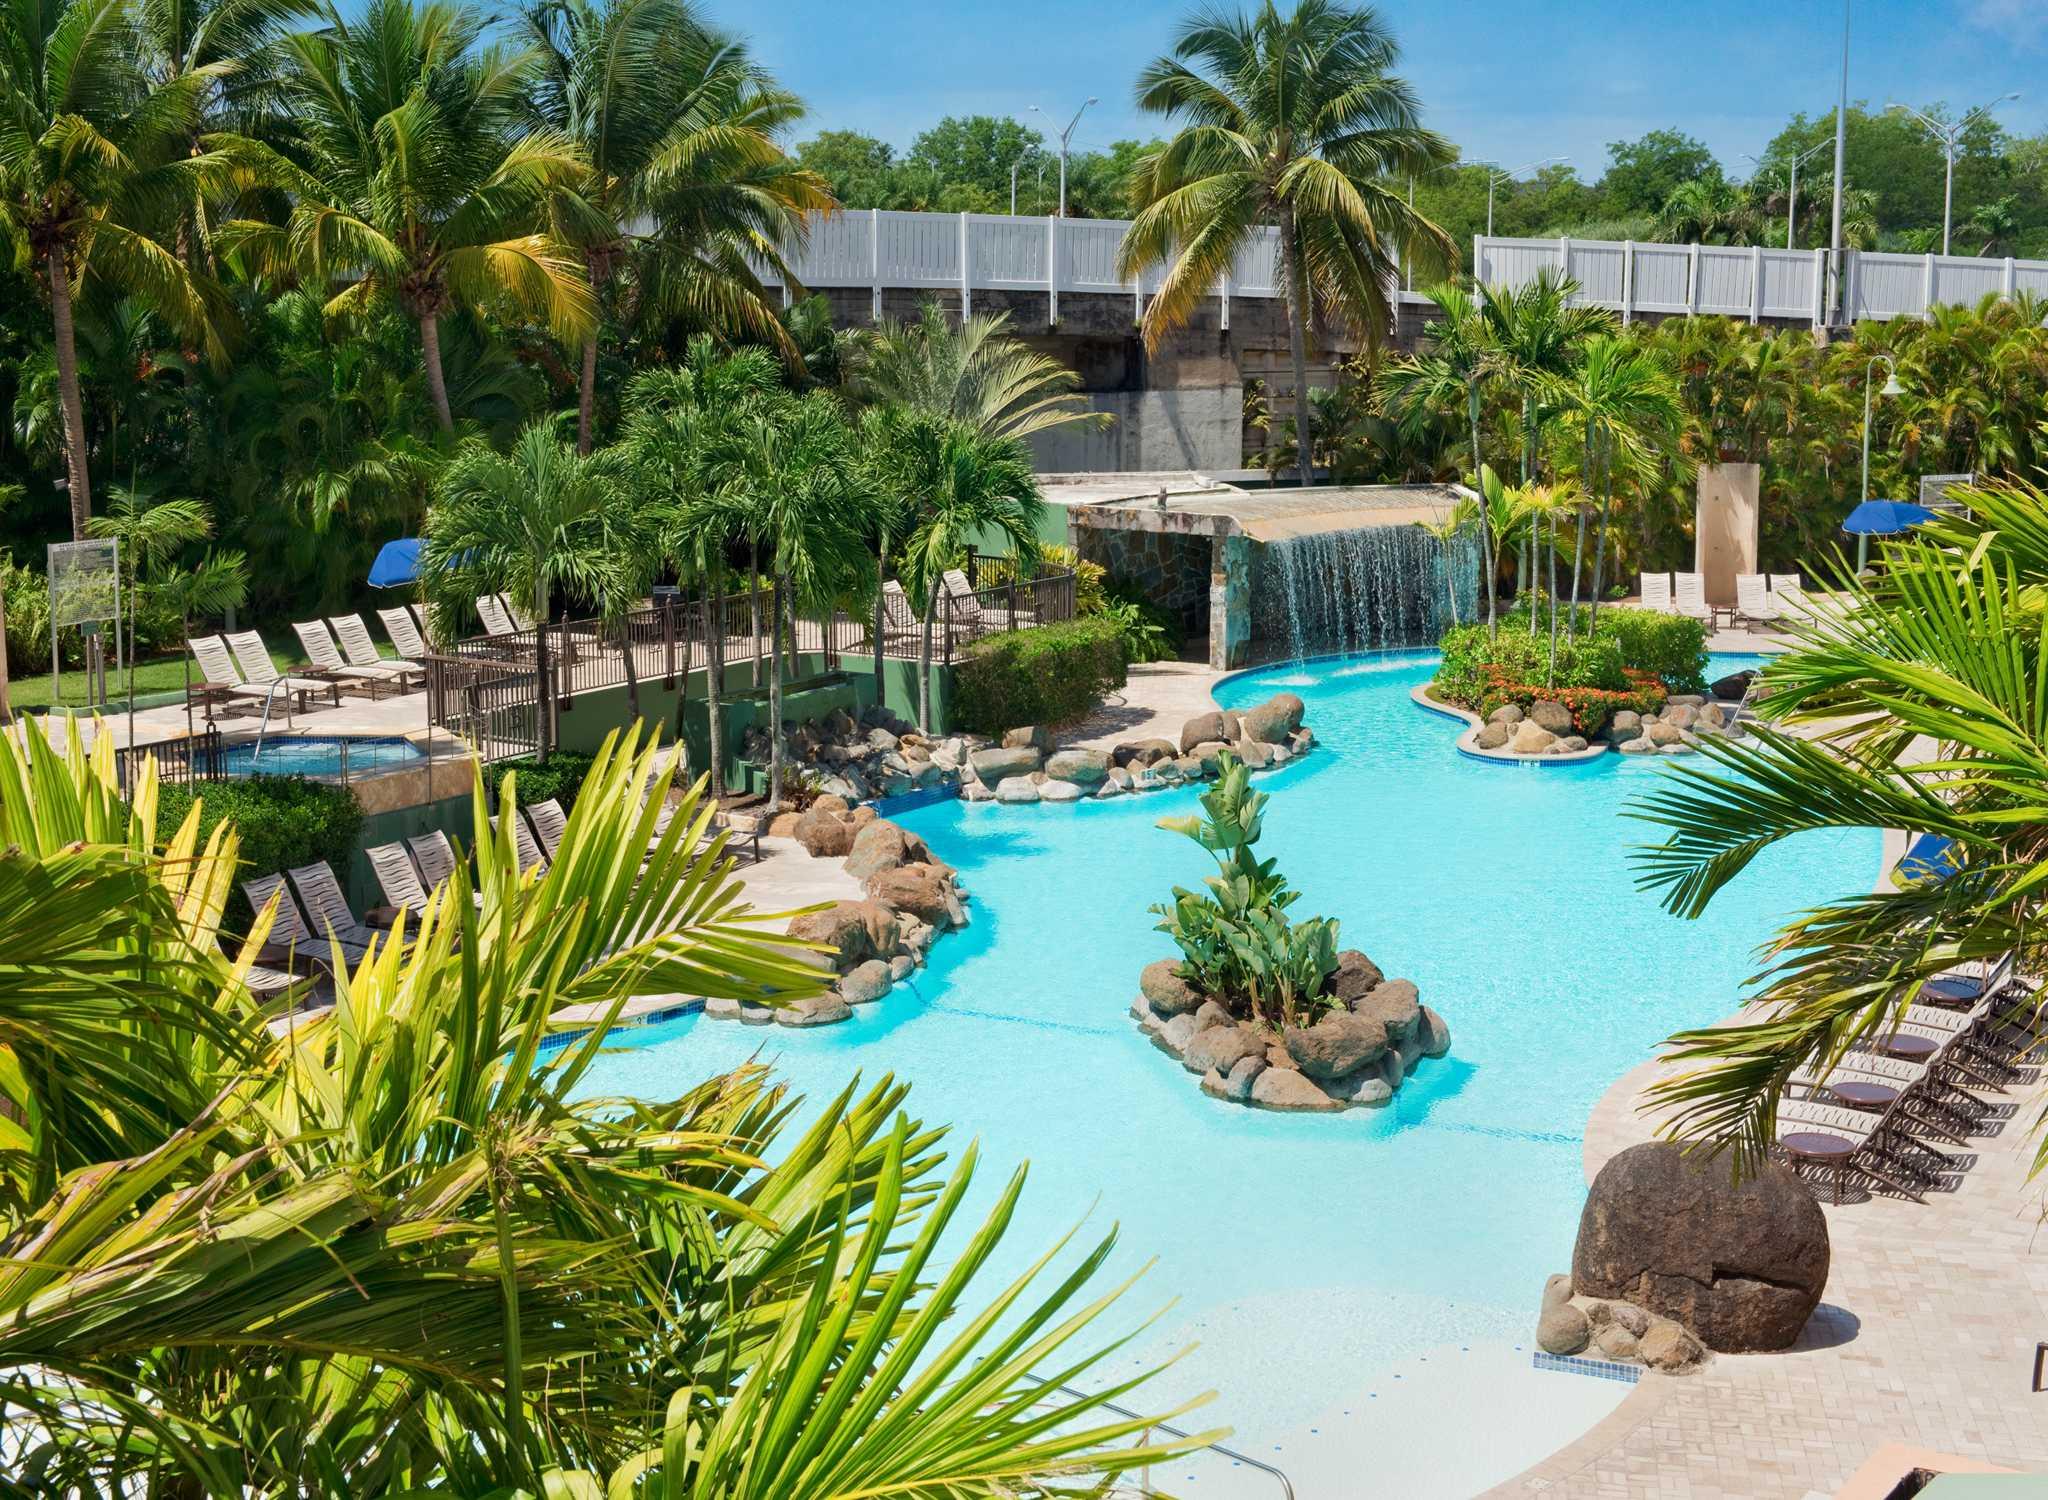 Hoteis e resorts em porto rico san juan hilton - Hoteles en ponce puerto rico ...